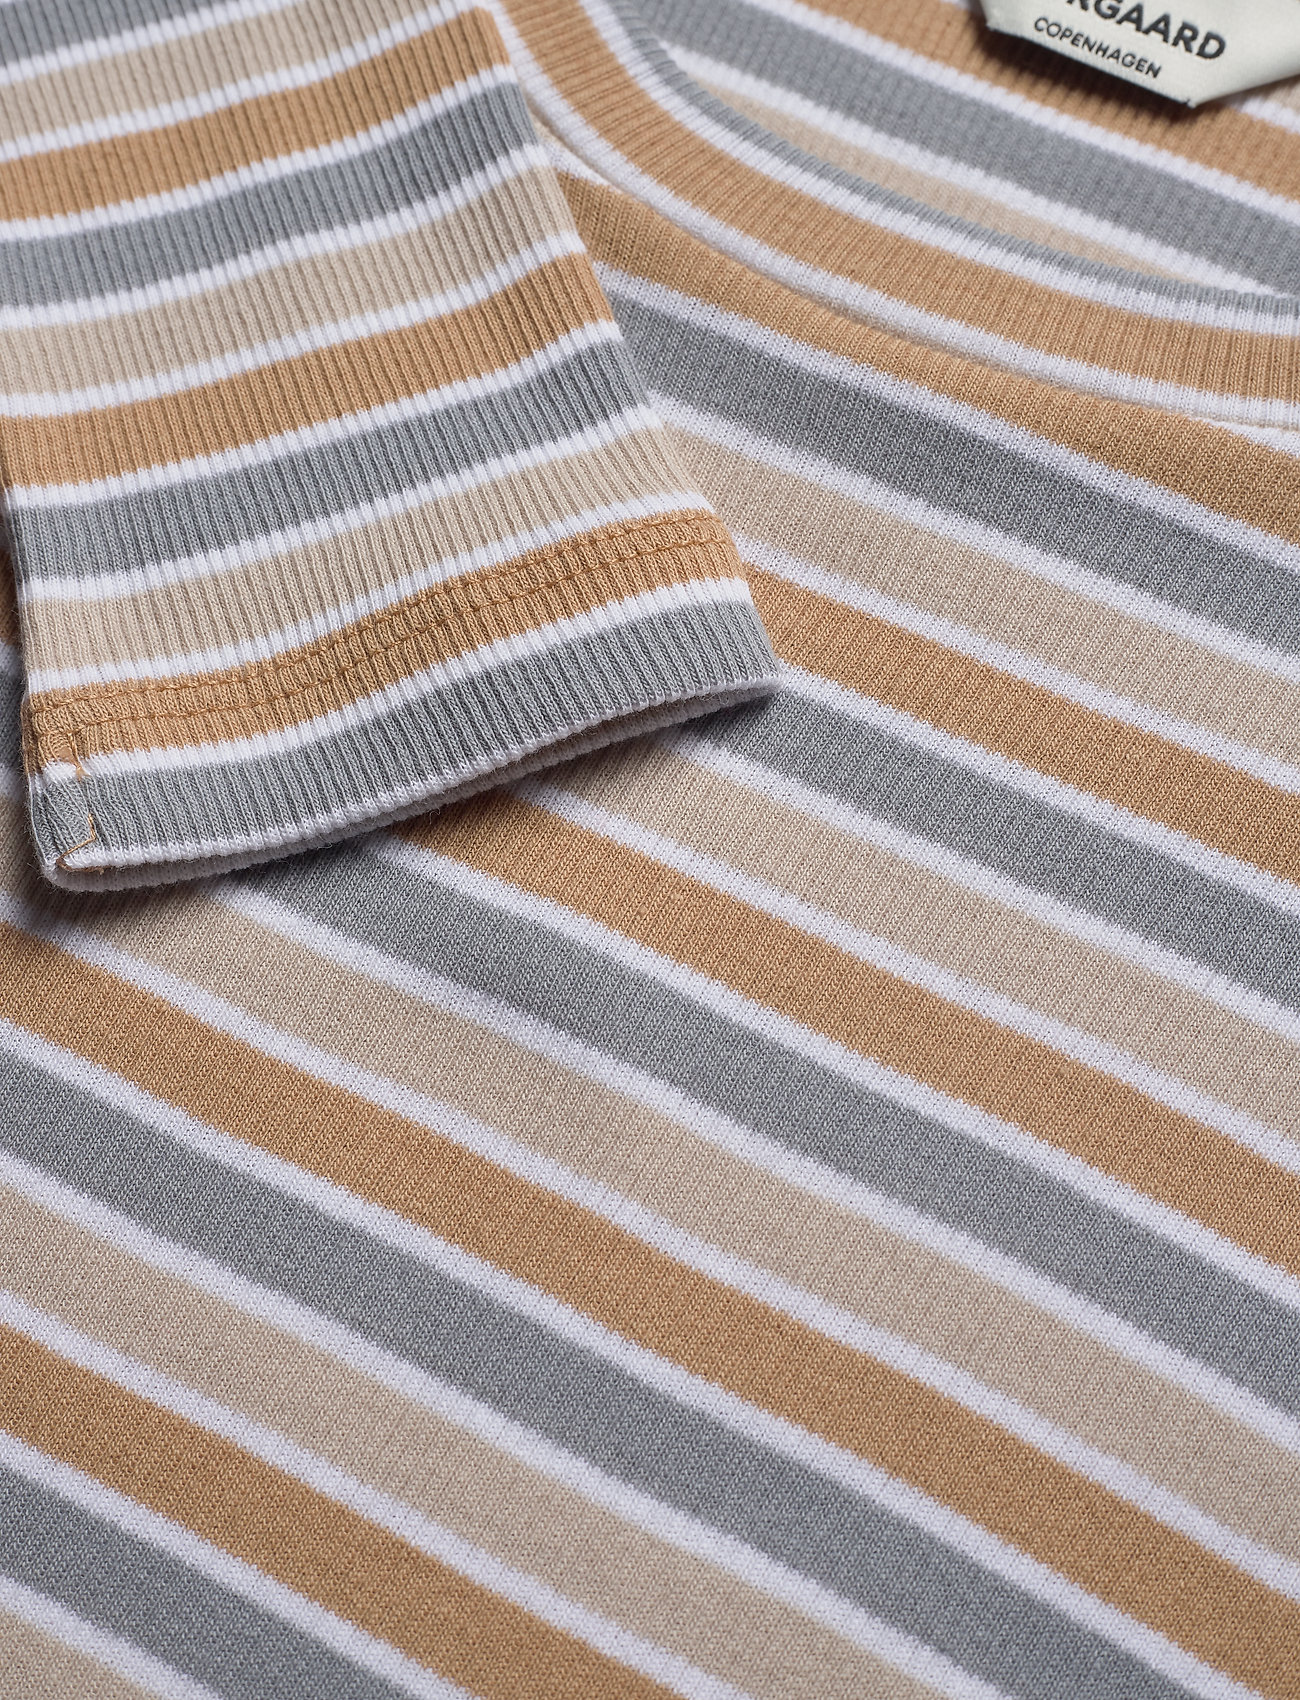 2x2 Softy Stripe Tuba (Multi Beige) (487.50 kr) - Mads Nørgaard